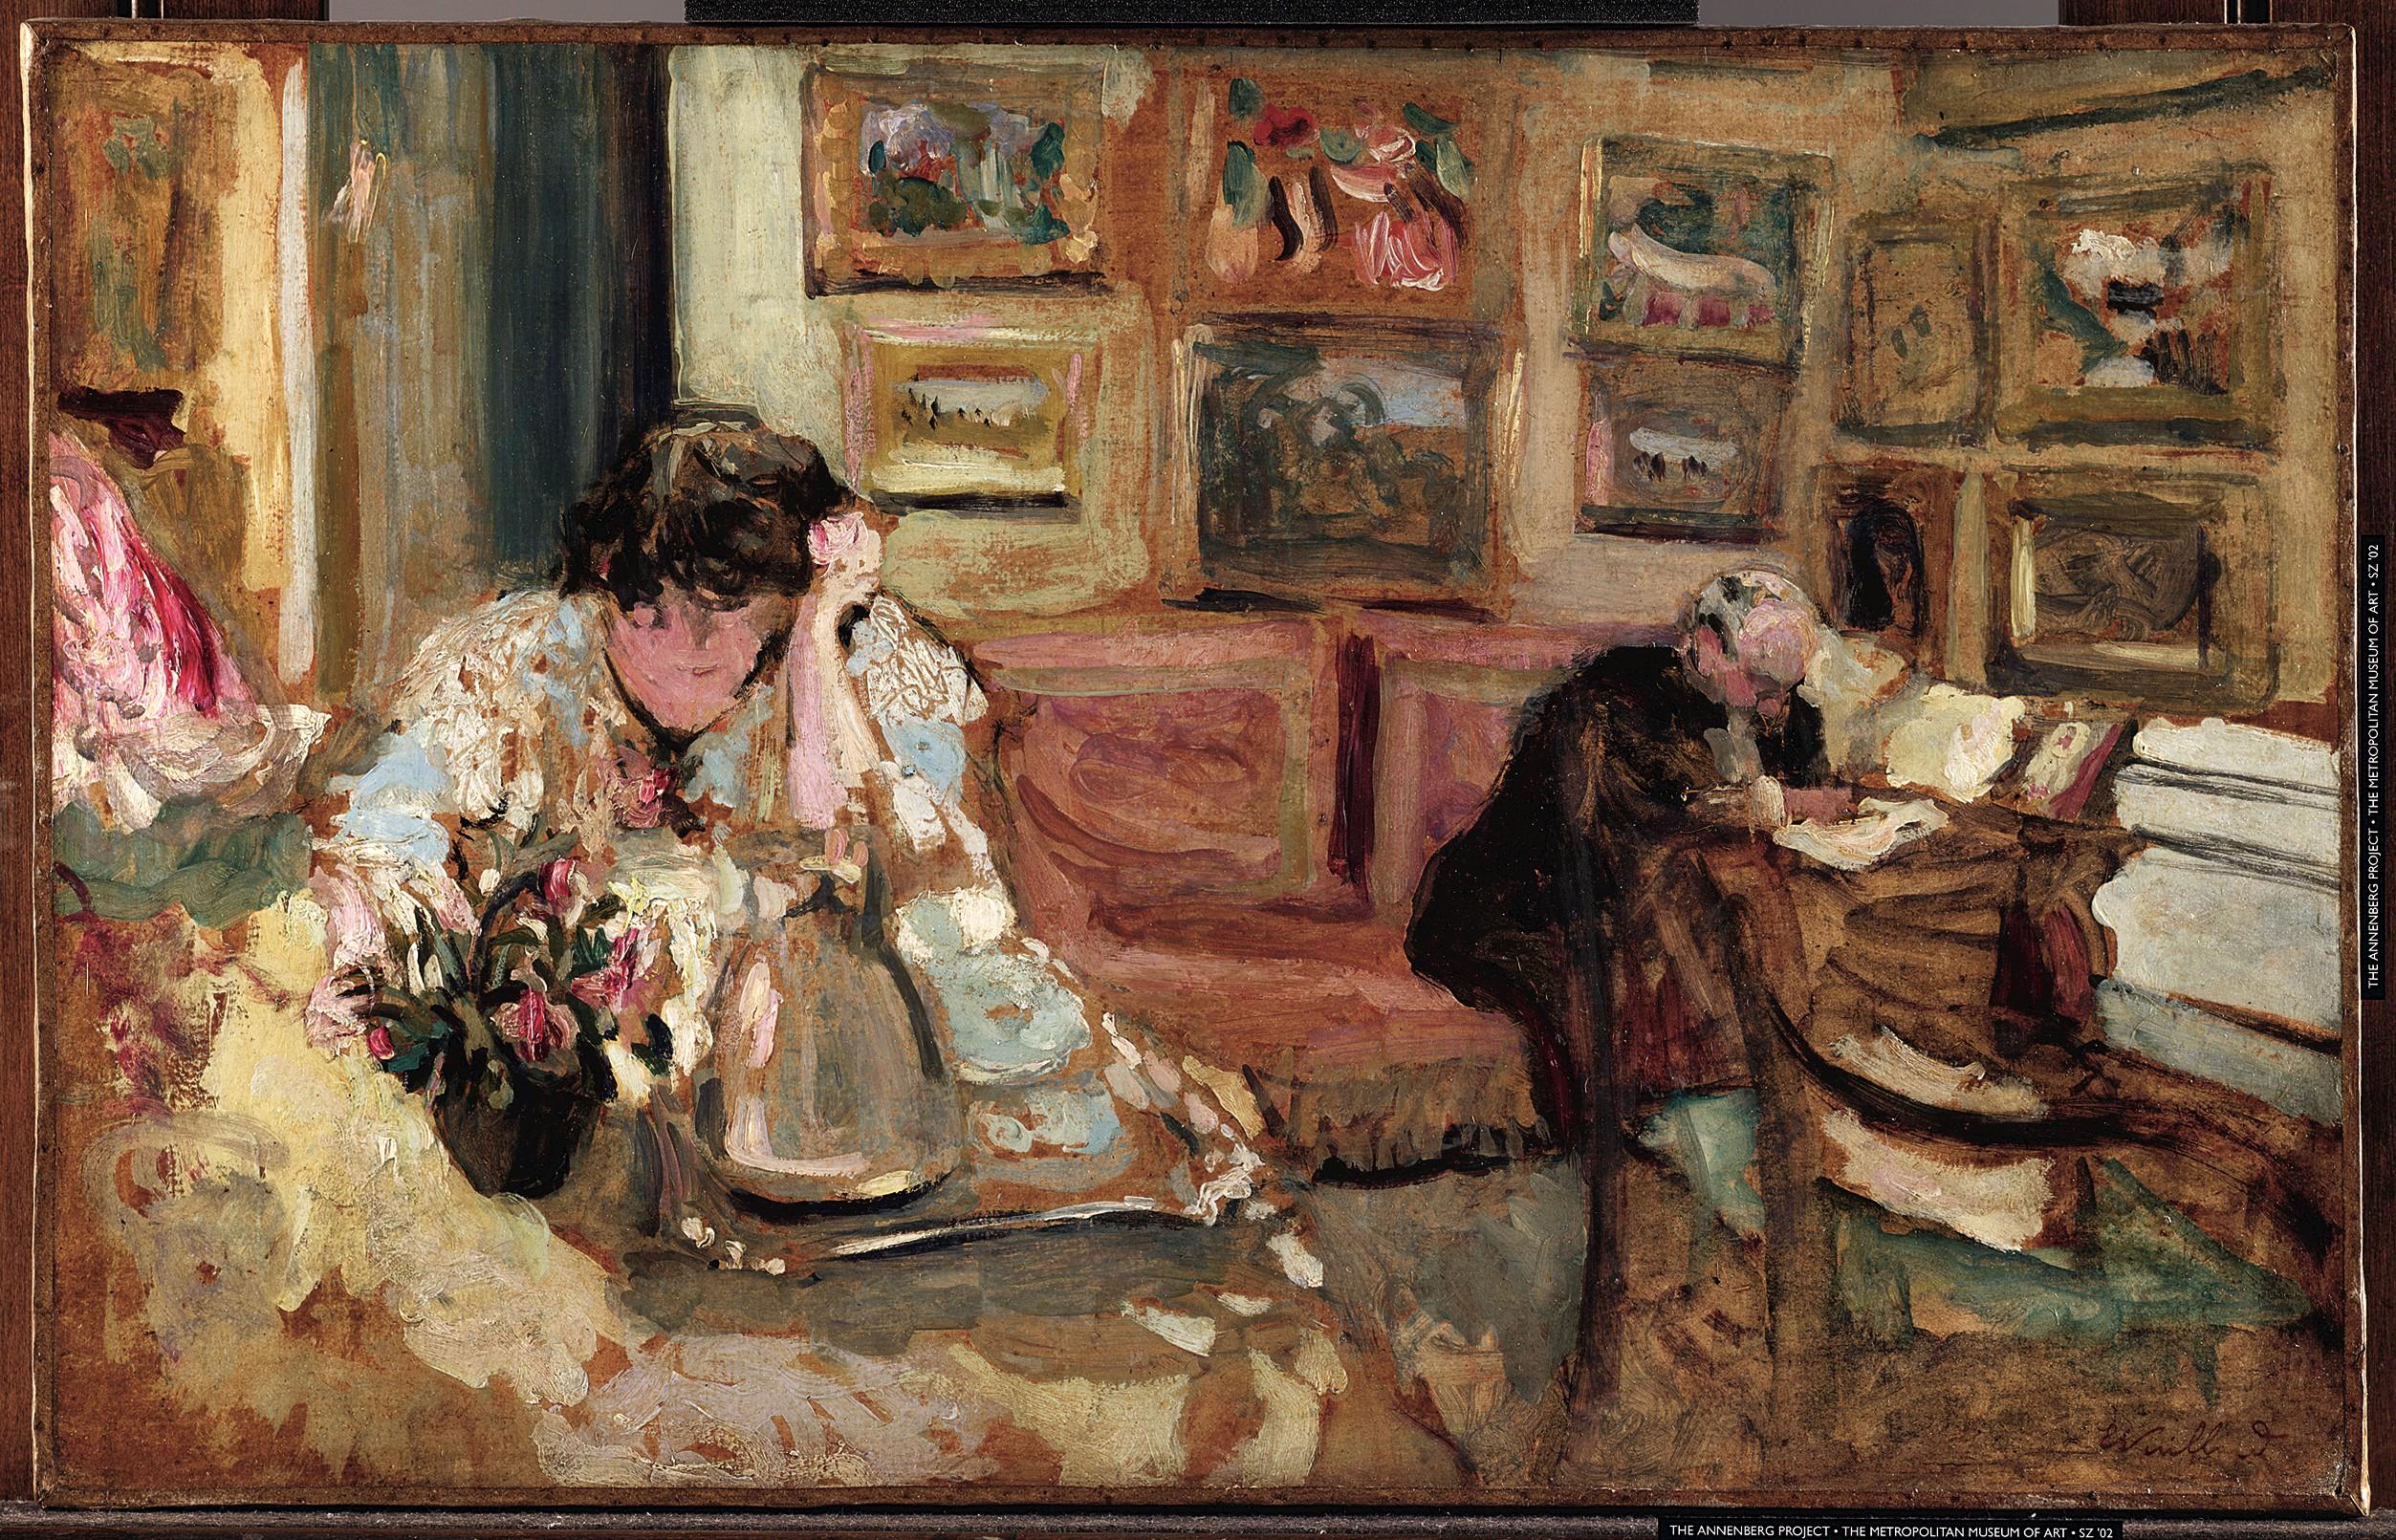 Édouard Vuillard, Jos and Lucie Hessel in the Small Salon, Rue de Rivoli